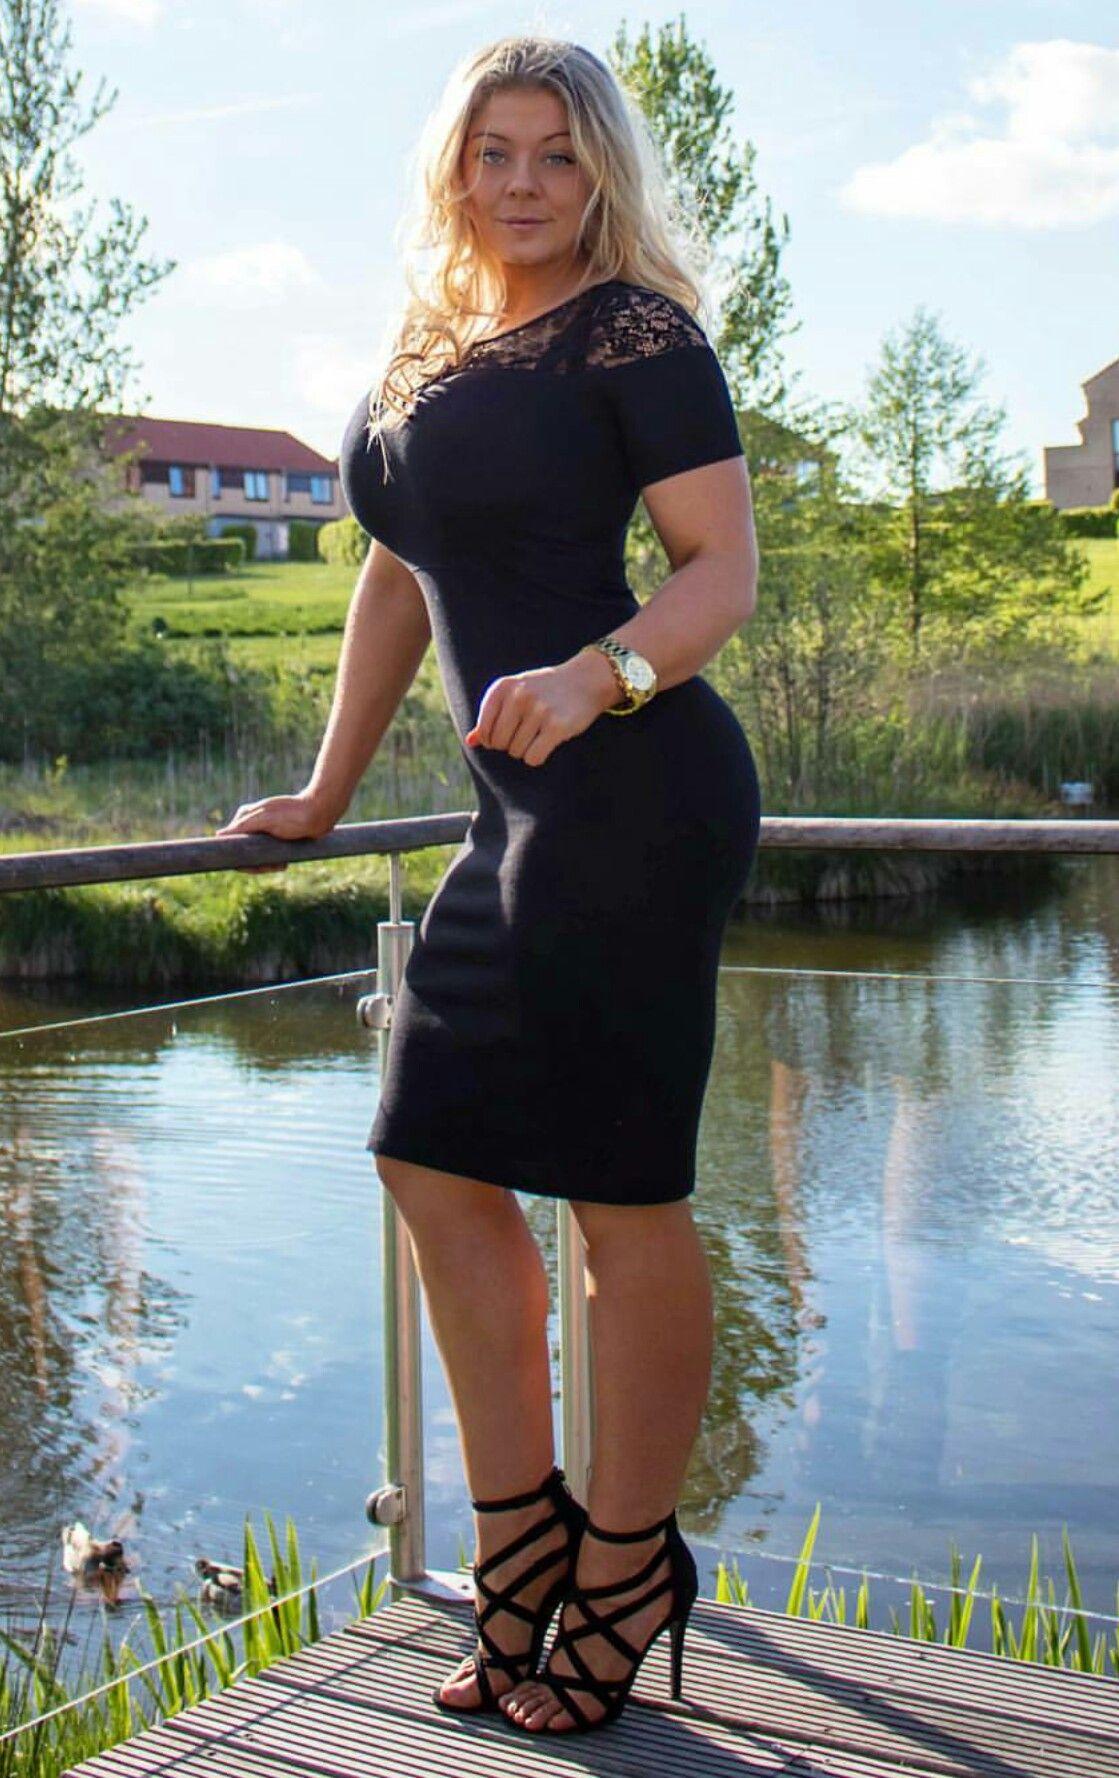 Mia Sand in her  littleblackdress  MissMiaFit  blonde  curves  Beautiful   fitnessmodel  Denmark 94b4ef16f3